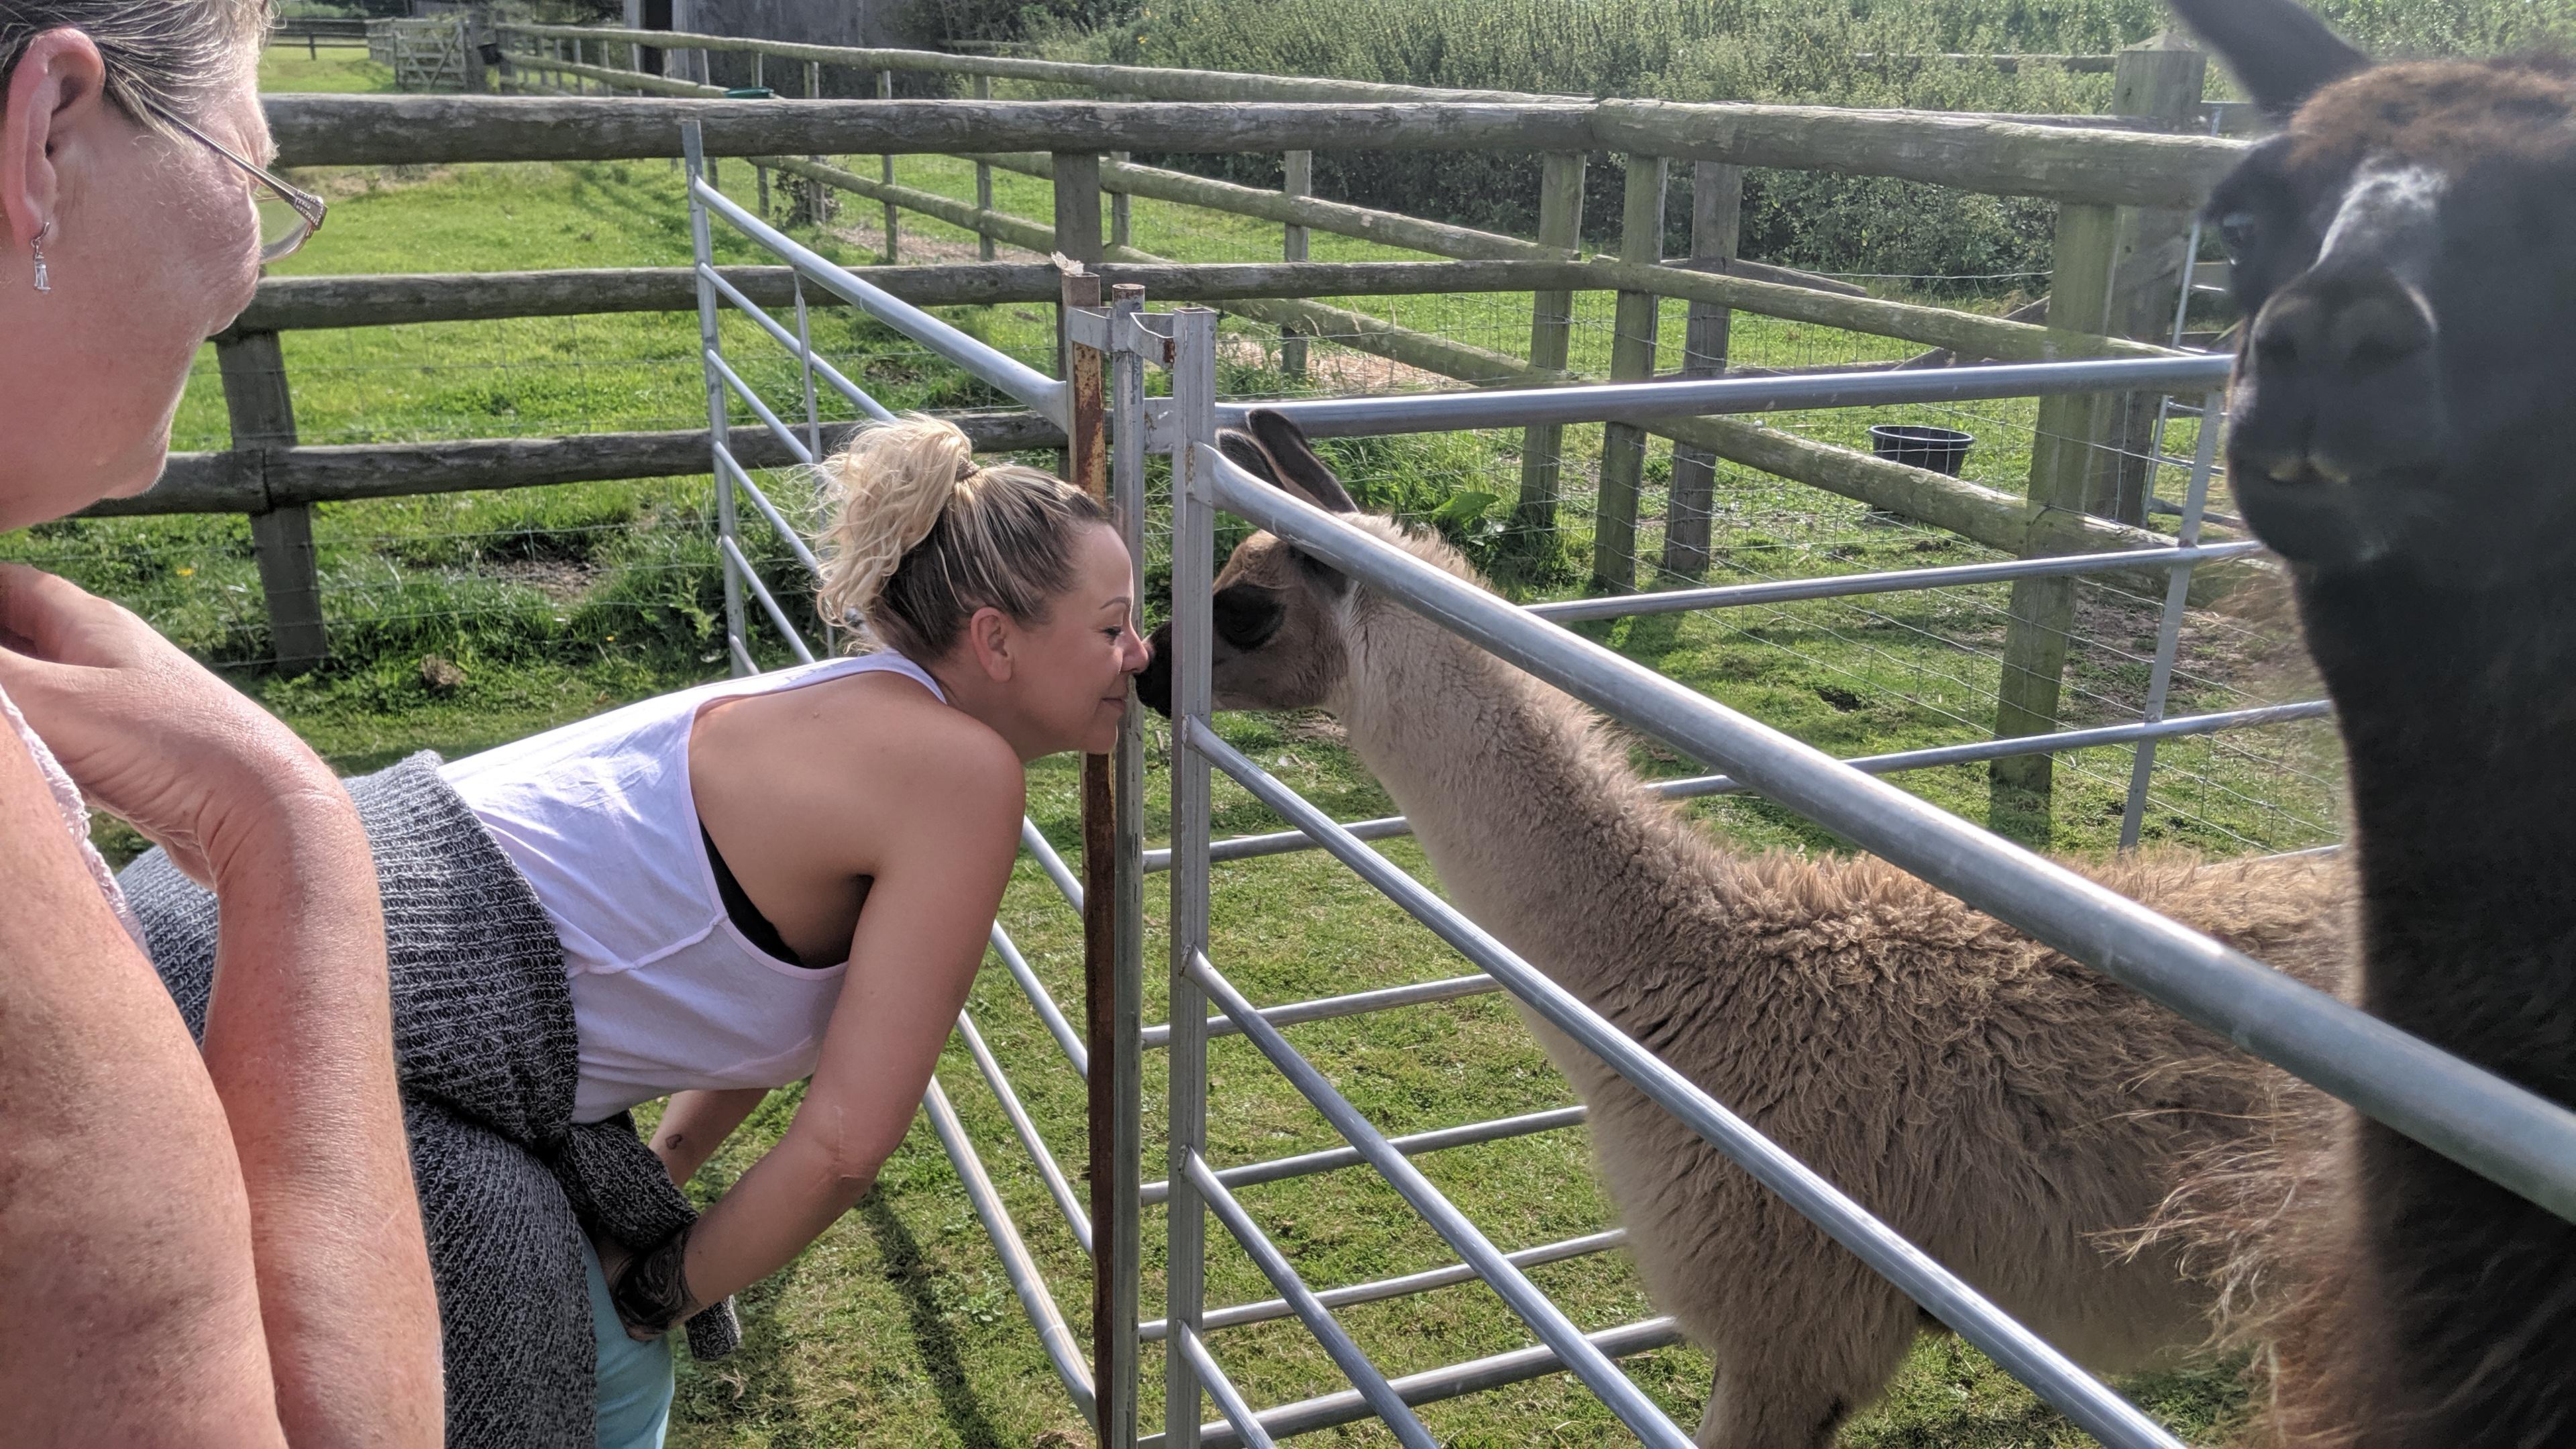 Llamas like to smell human faces